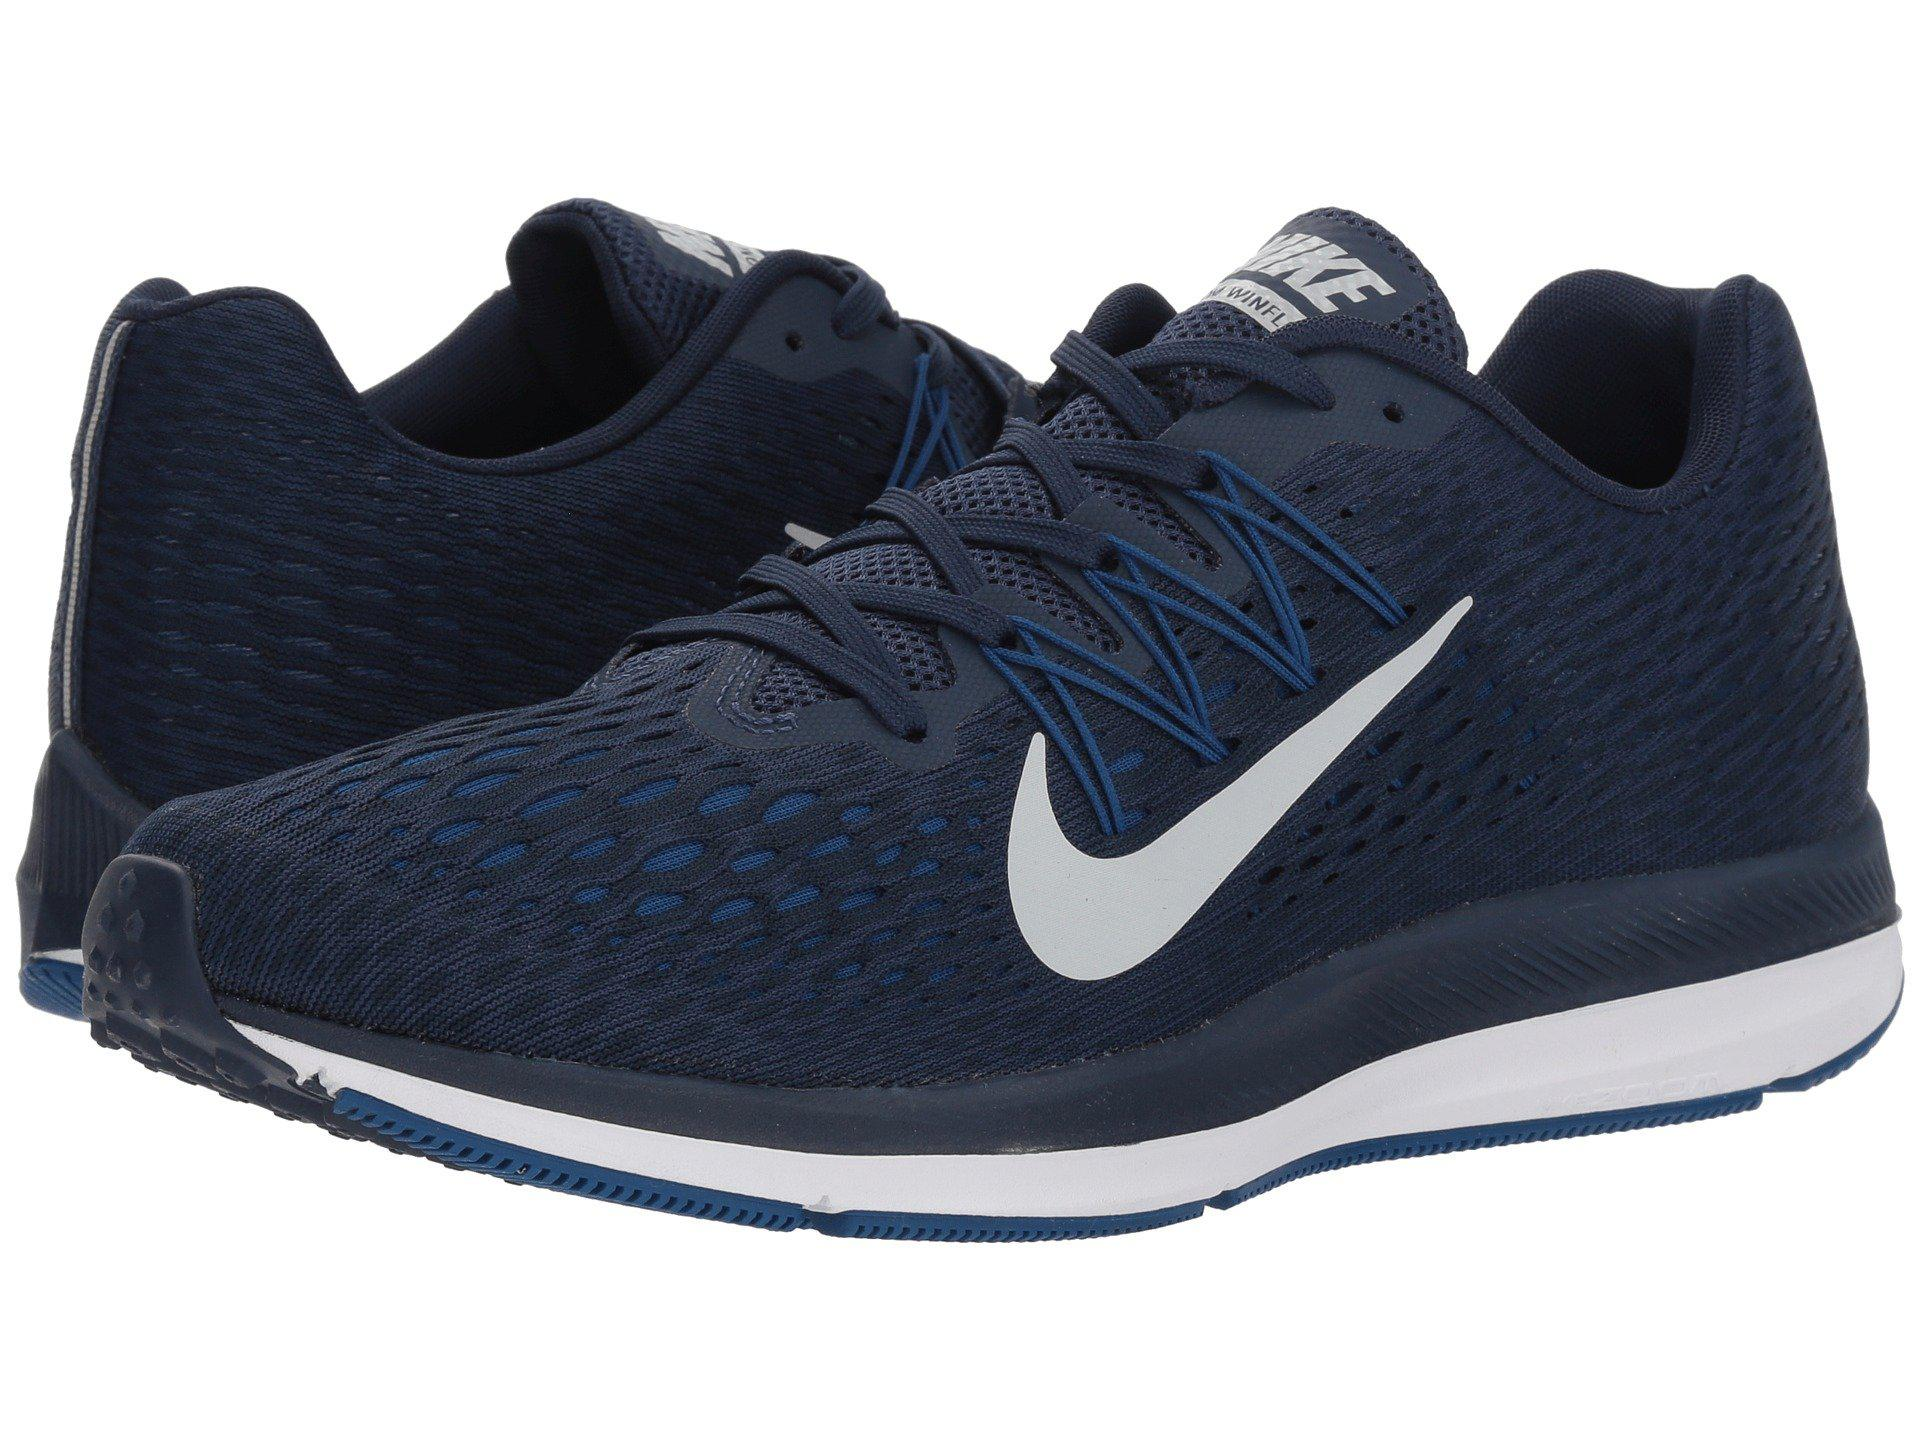 497e9b6ead42 germany nike air zoom winflo 5 midnight navy pure platinum mens running  shoes cdf47 0e05b  official store nike. blue air zoom winflo 15b09 a1b9e